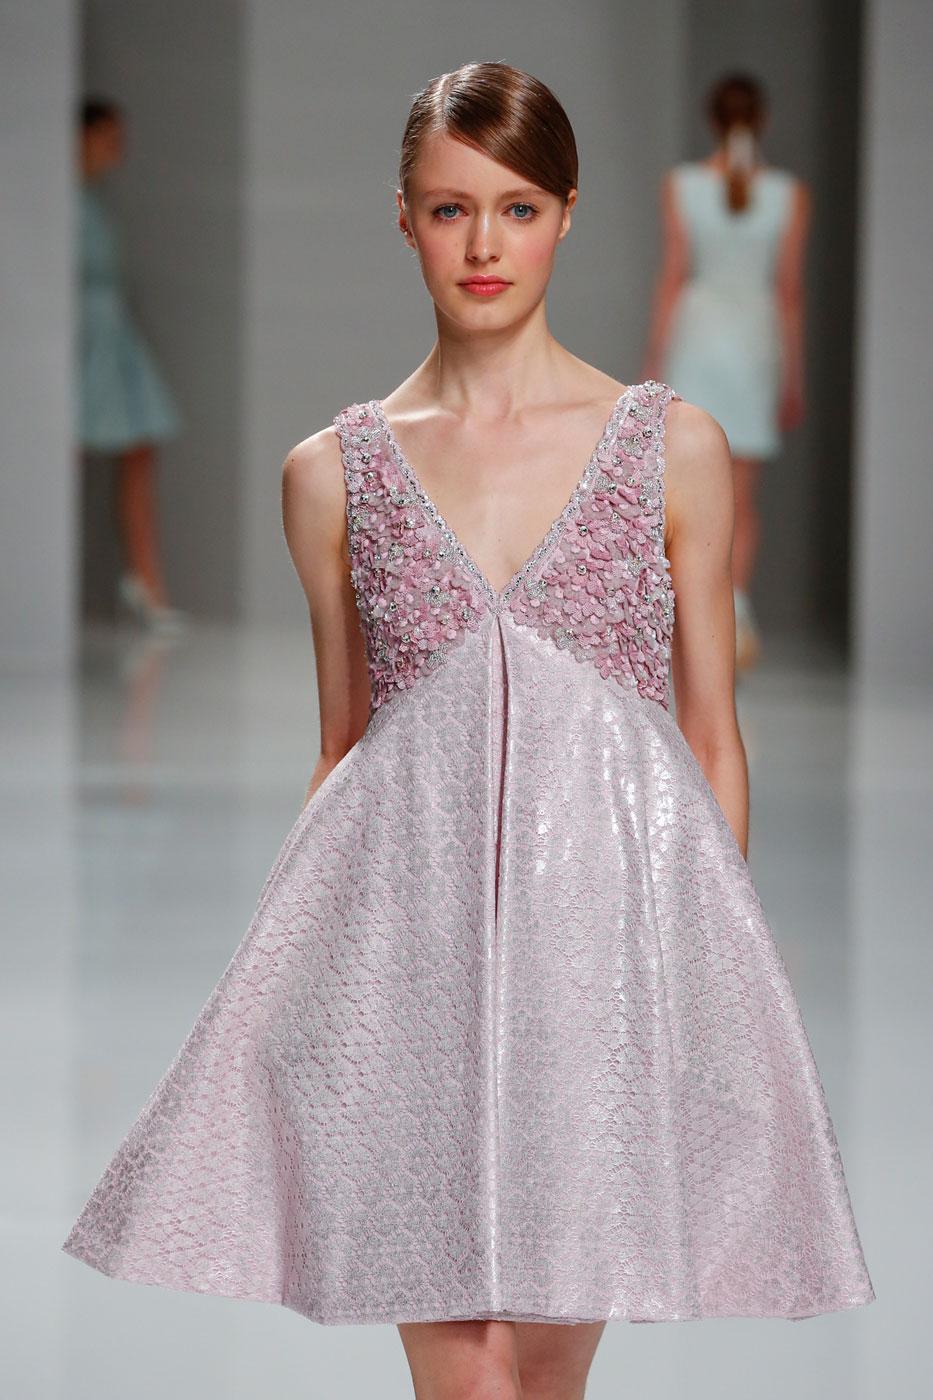 Georges-Hobeika-fashion-runway-show-haute-couture-paris-spring-2015-the-impression-10